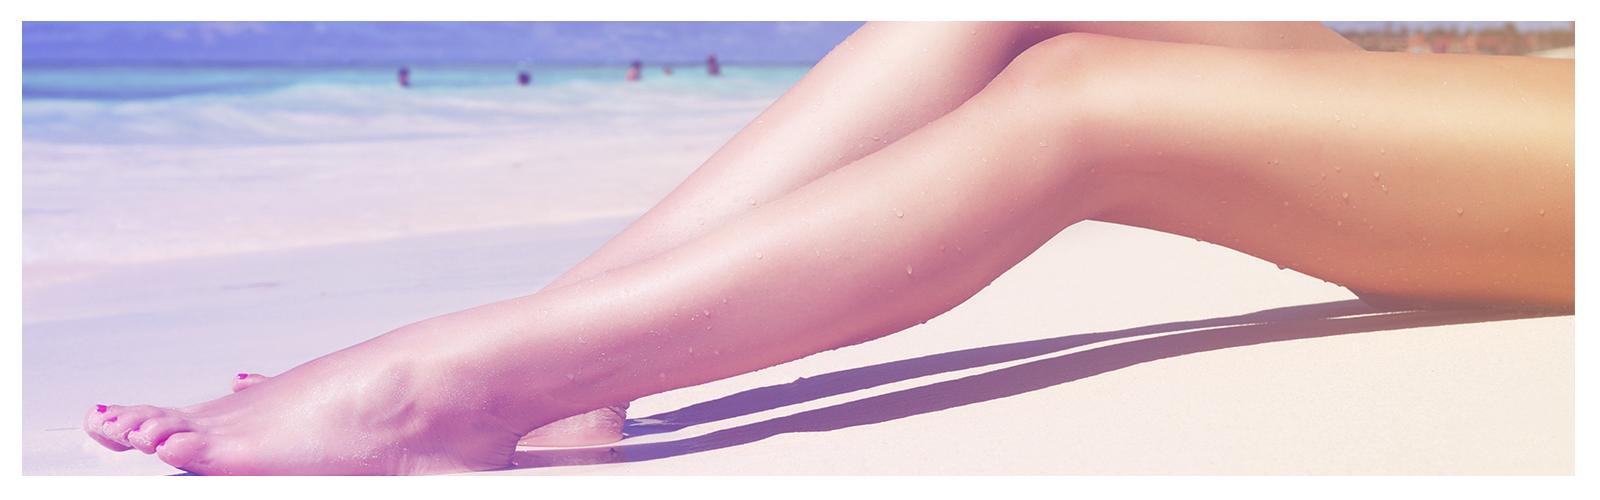 Rutina para lograr las piernas perfectas